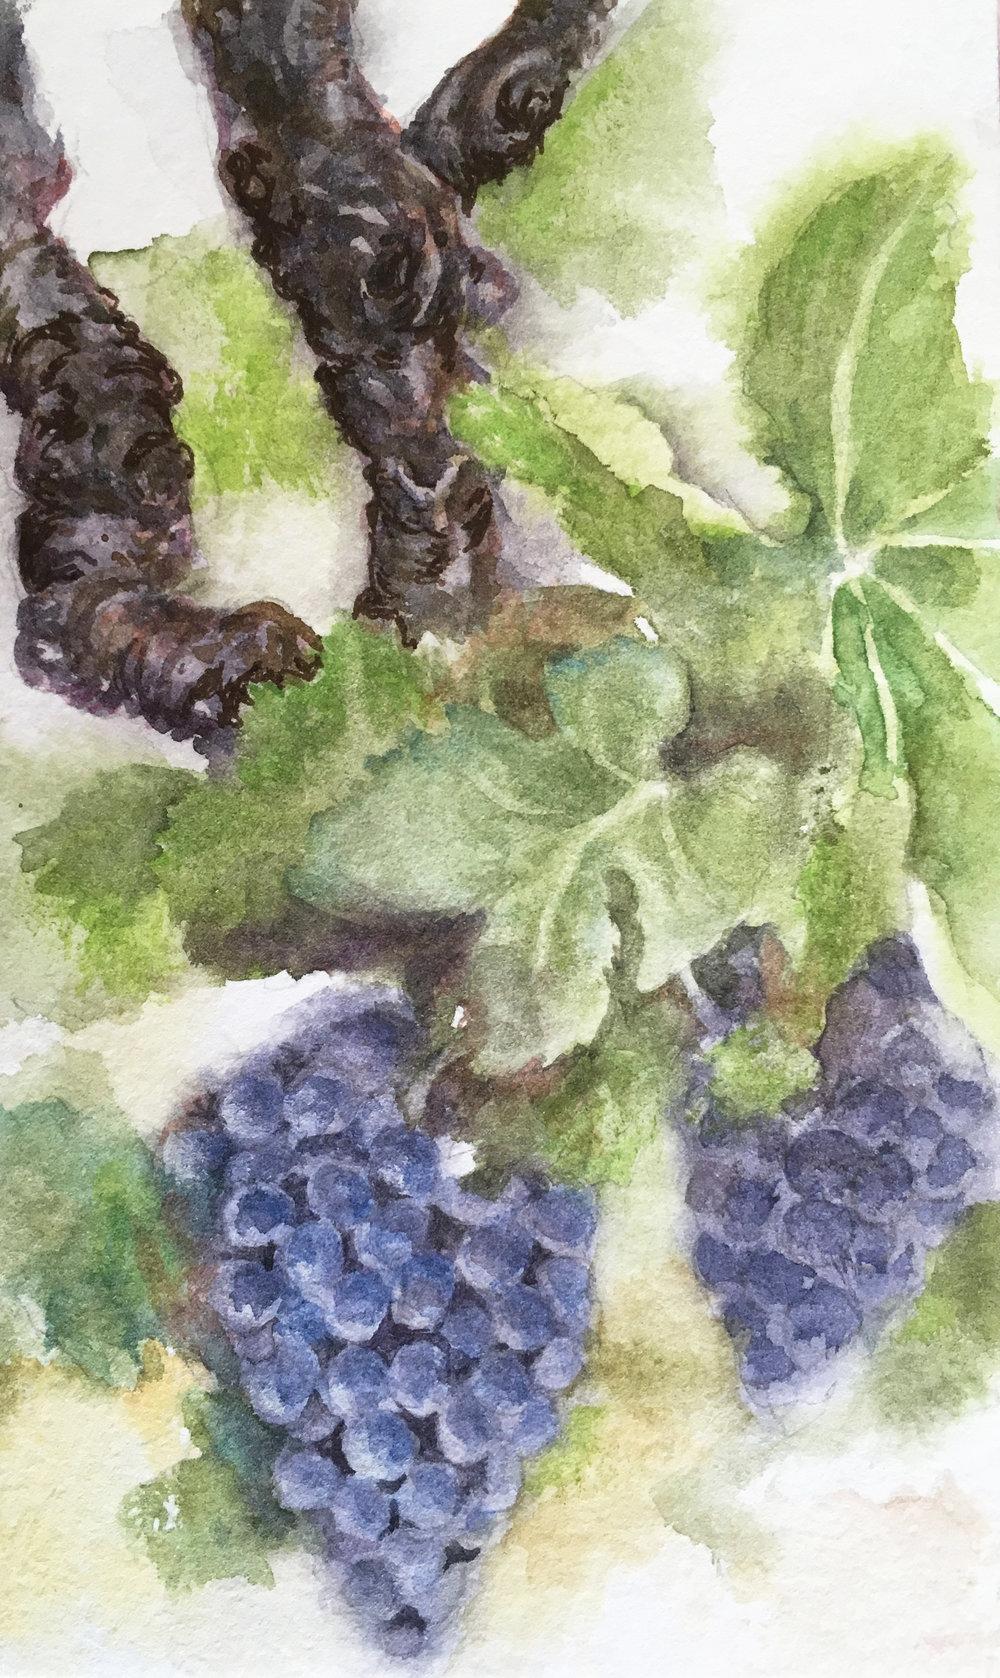 grapes on the vine.jpg